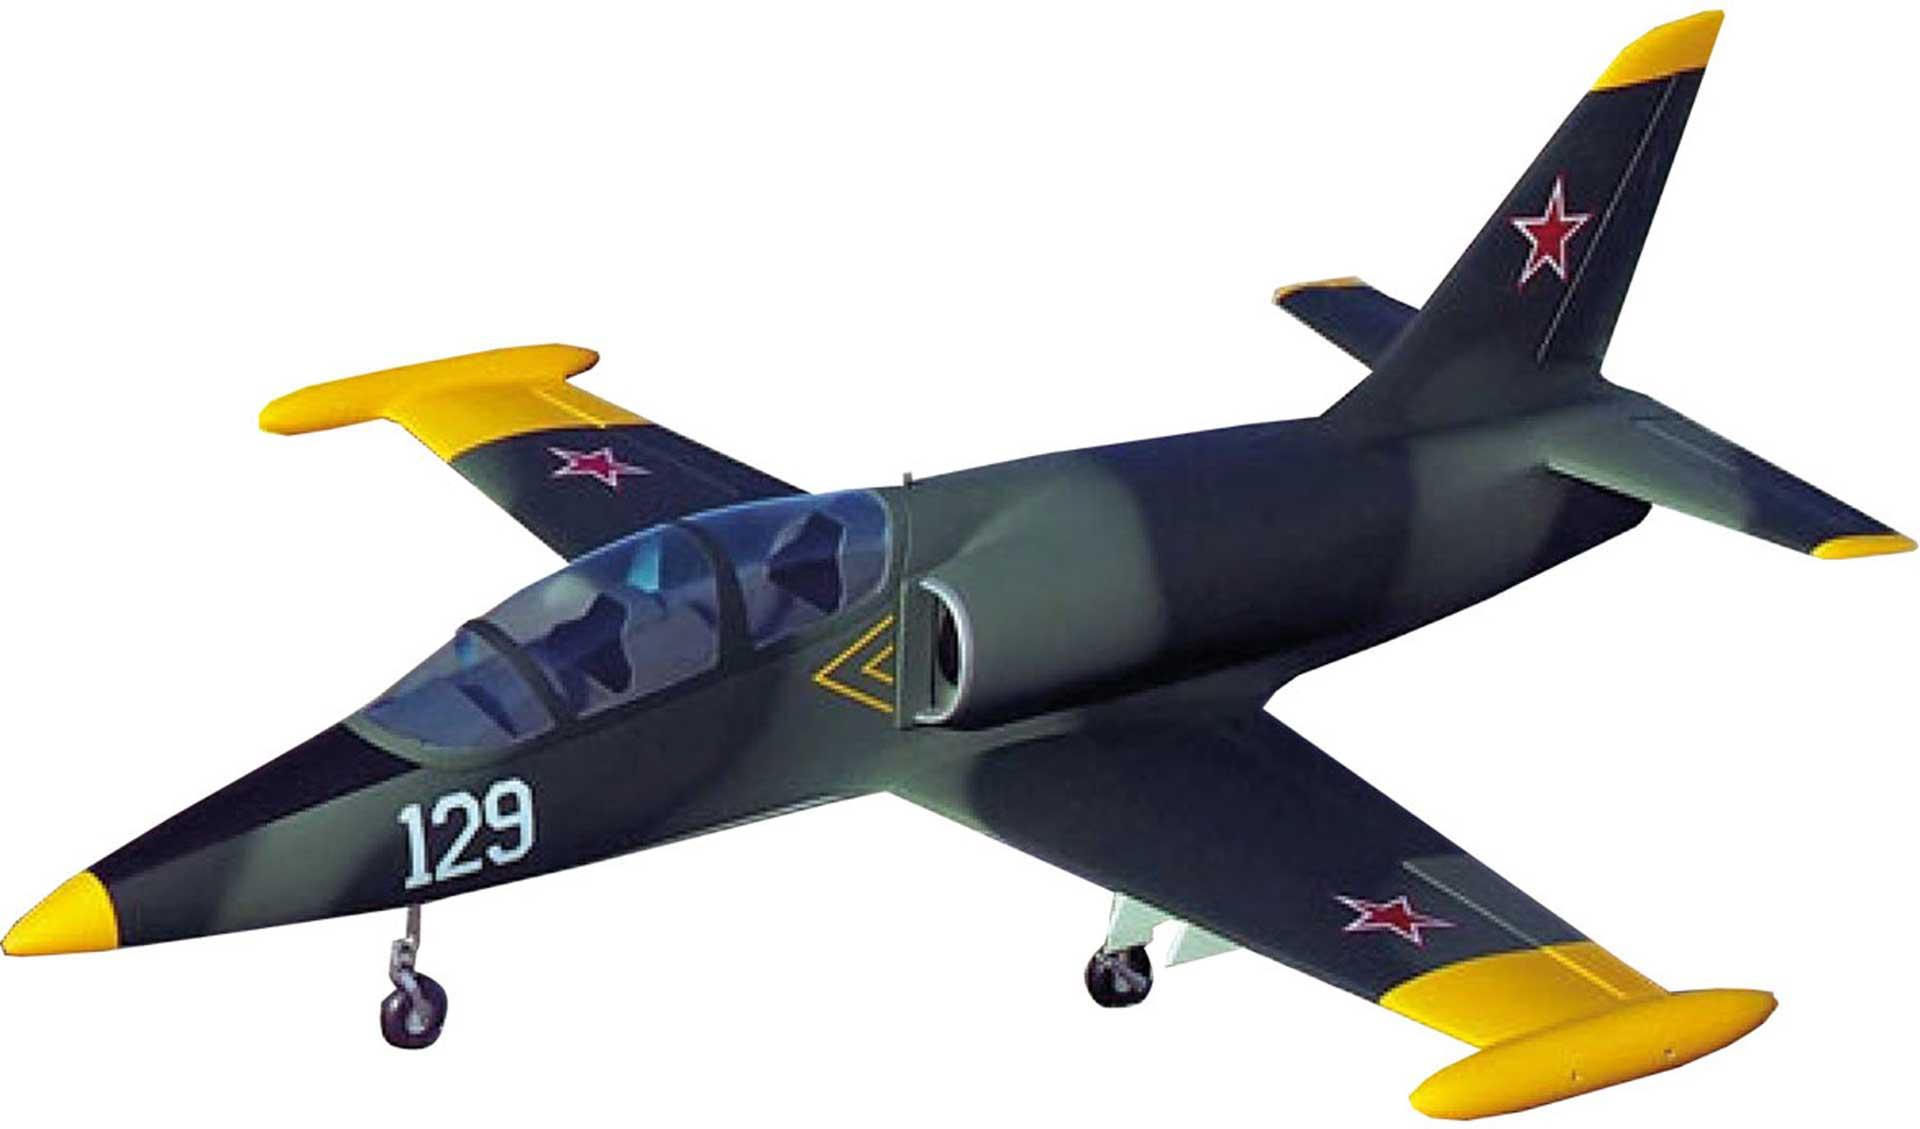 SEBART ALBATROS MINI L-39 MILITARY +ALBATROS MINI L-39 BLUE ANGELS